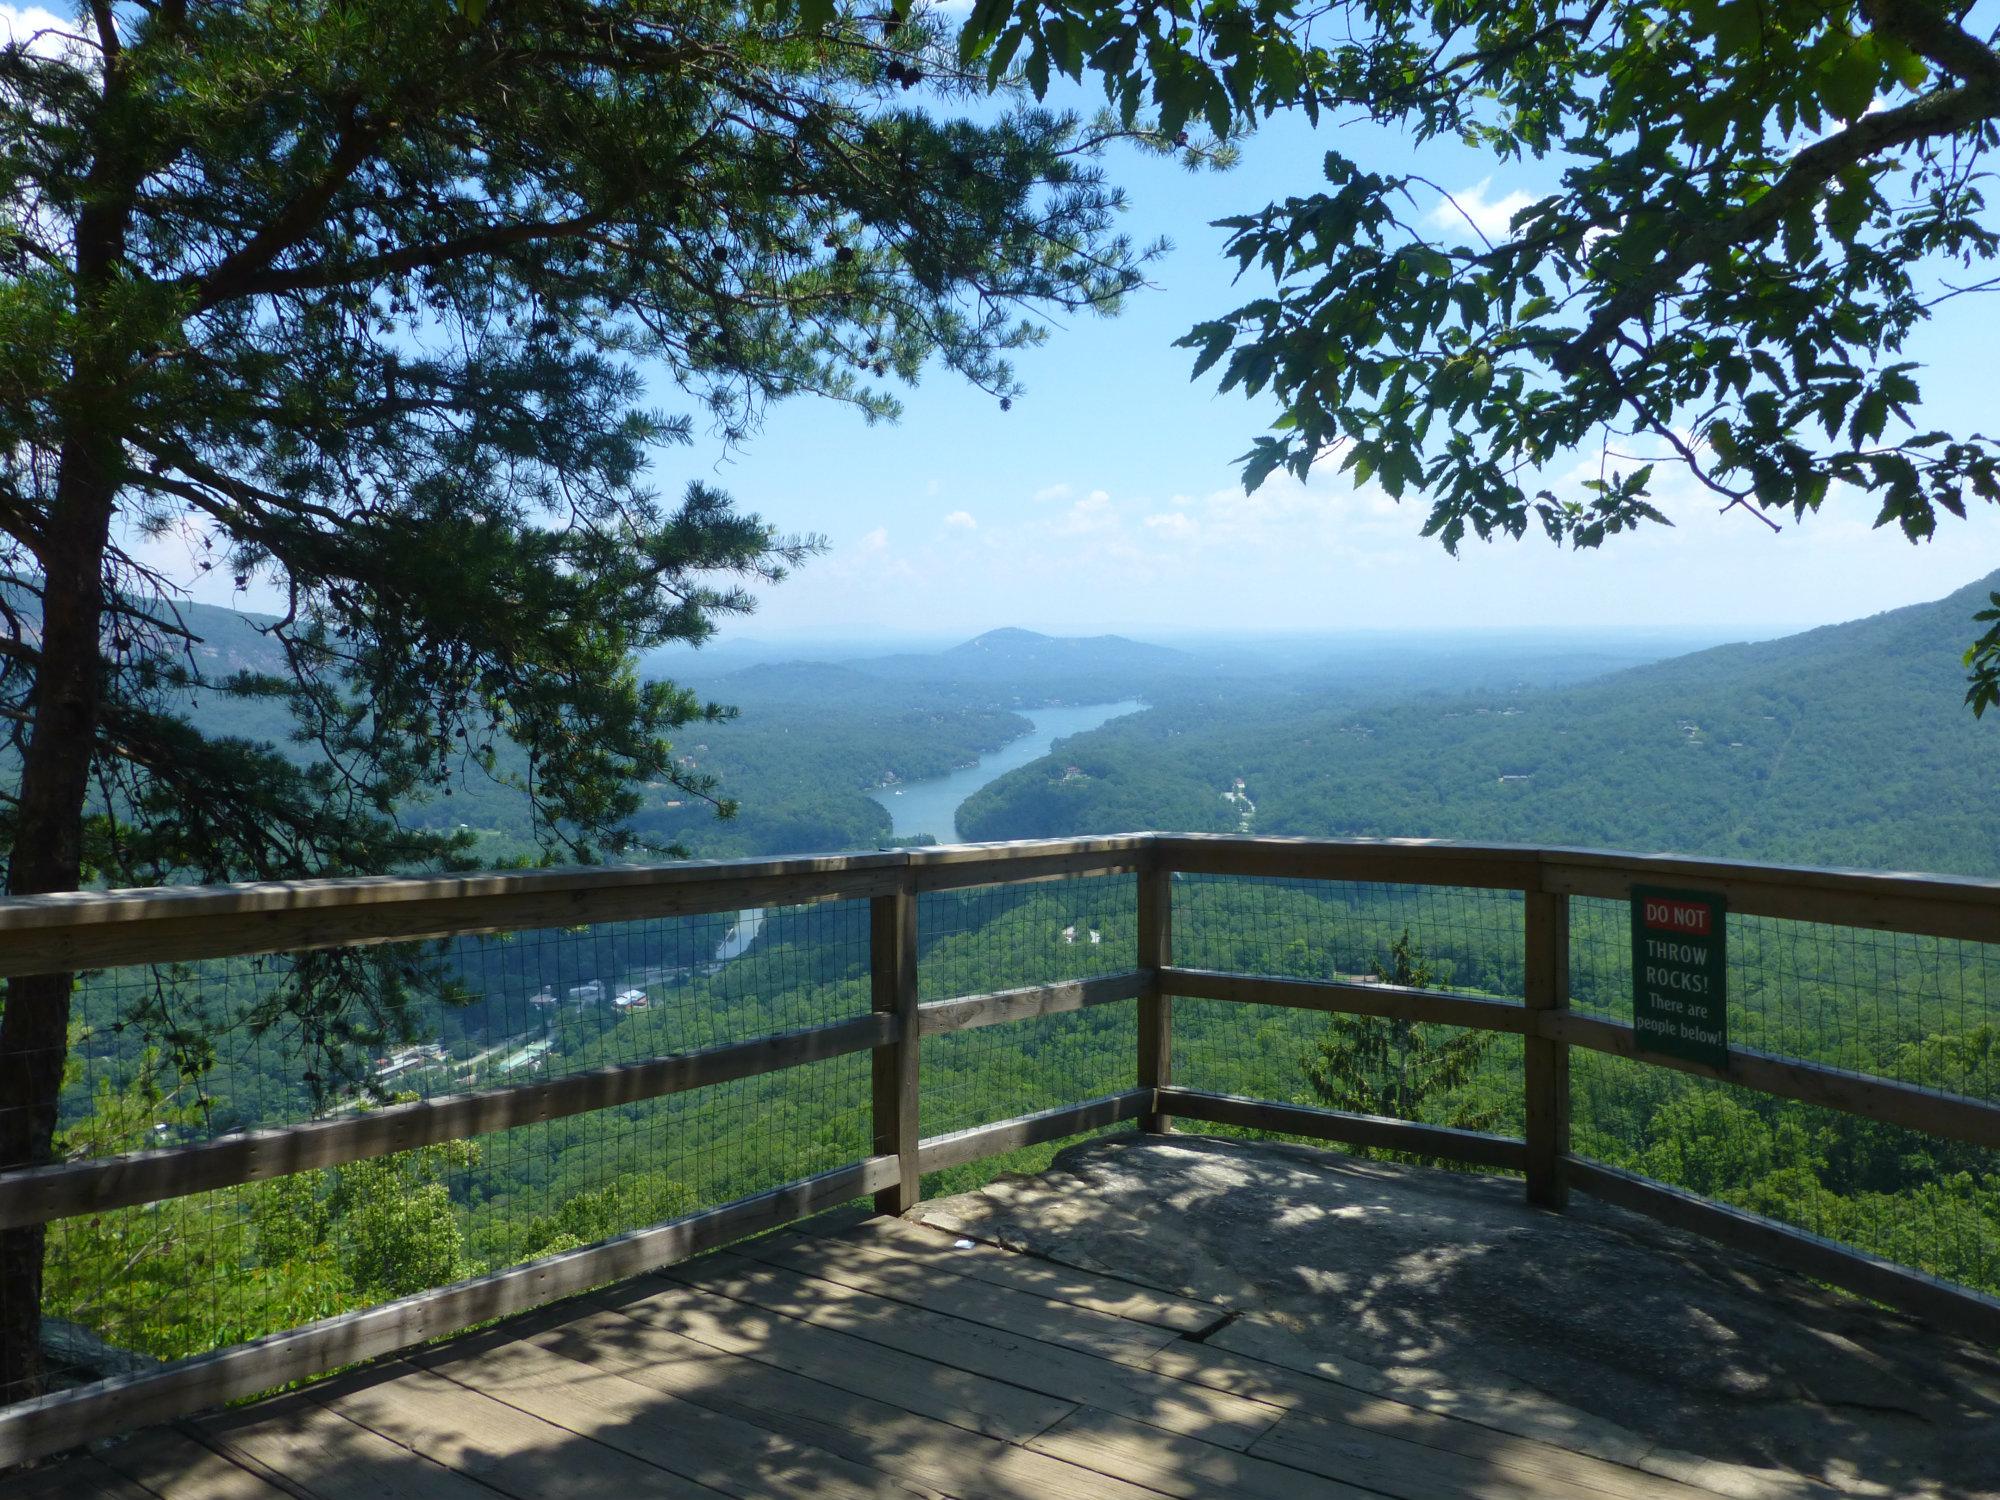 Chimney Rock Vista Rock View July 2016